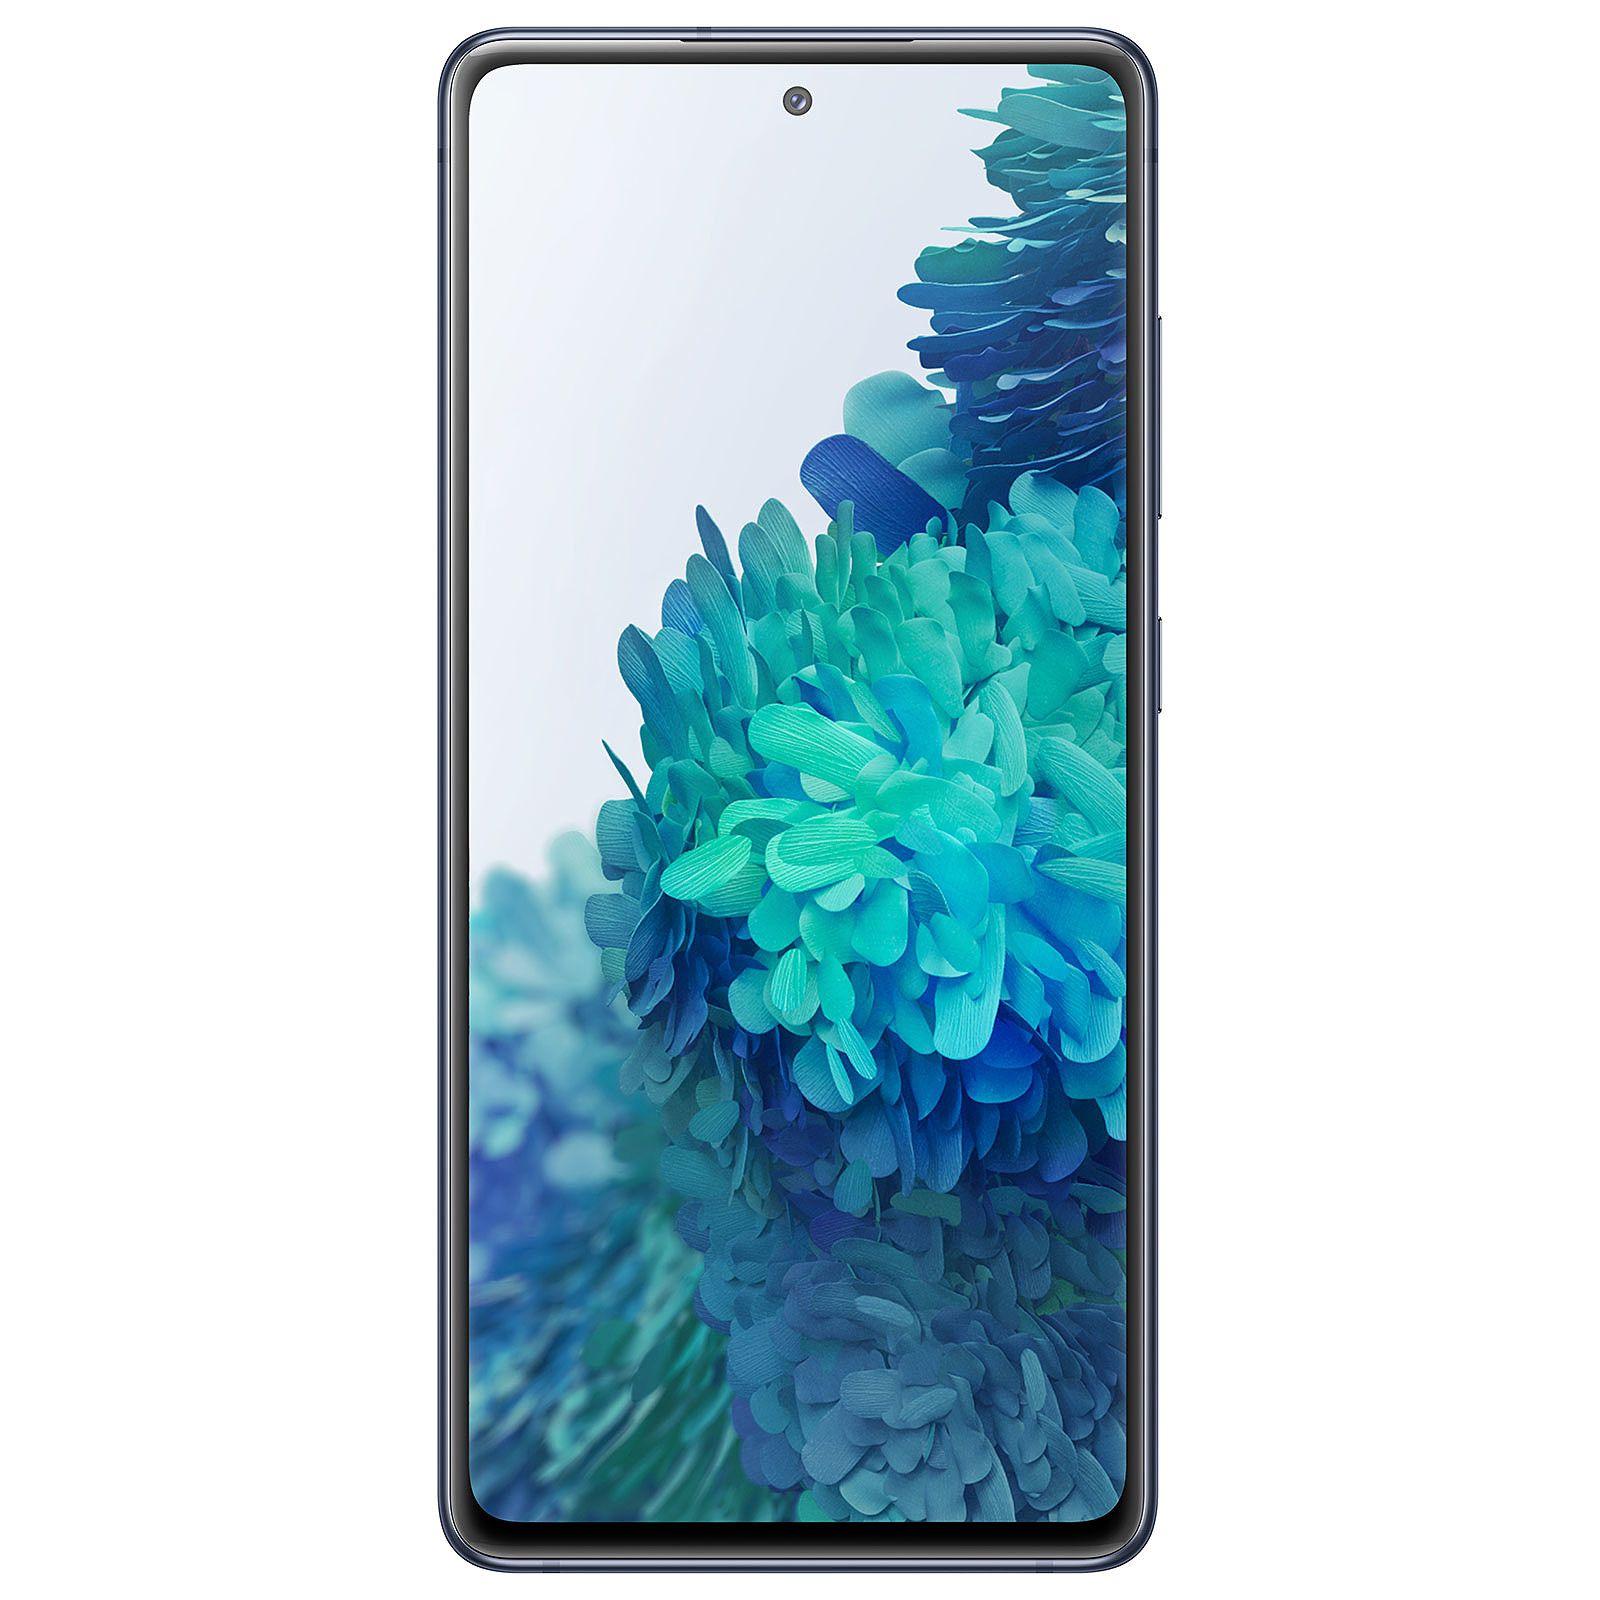 "Samsung Galaxy S20 FE 5G 128/6GB + 100€ Amazon Gutschein (Snapdragon 865, 6.5"" 120Hz Amoled Display, 4500mAh Akku, IP68, NFC)"